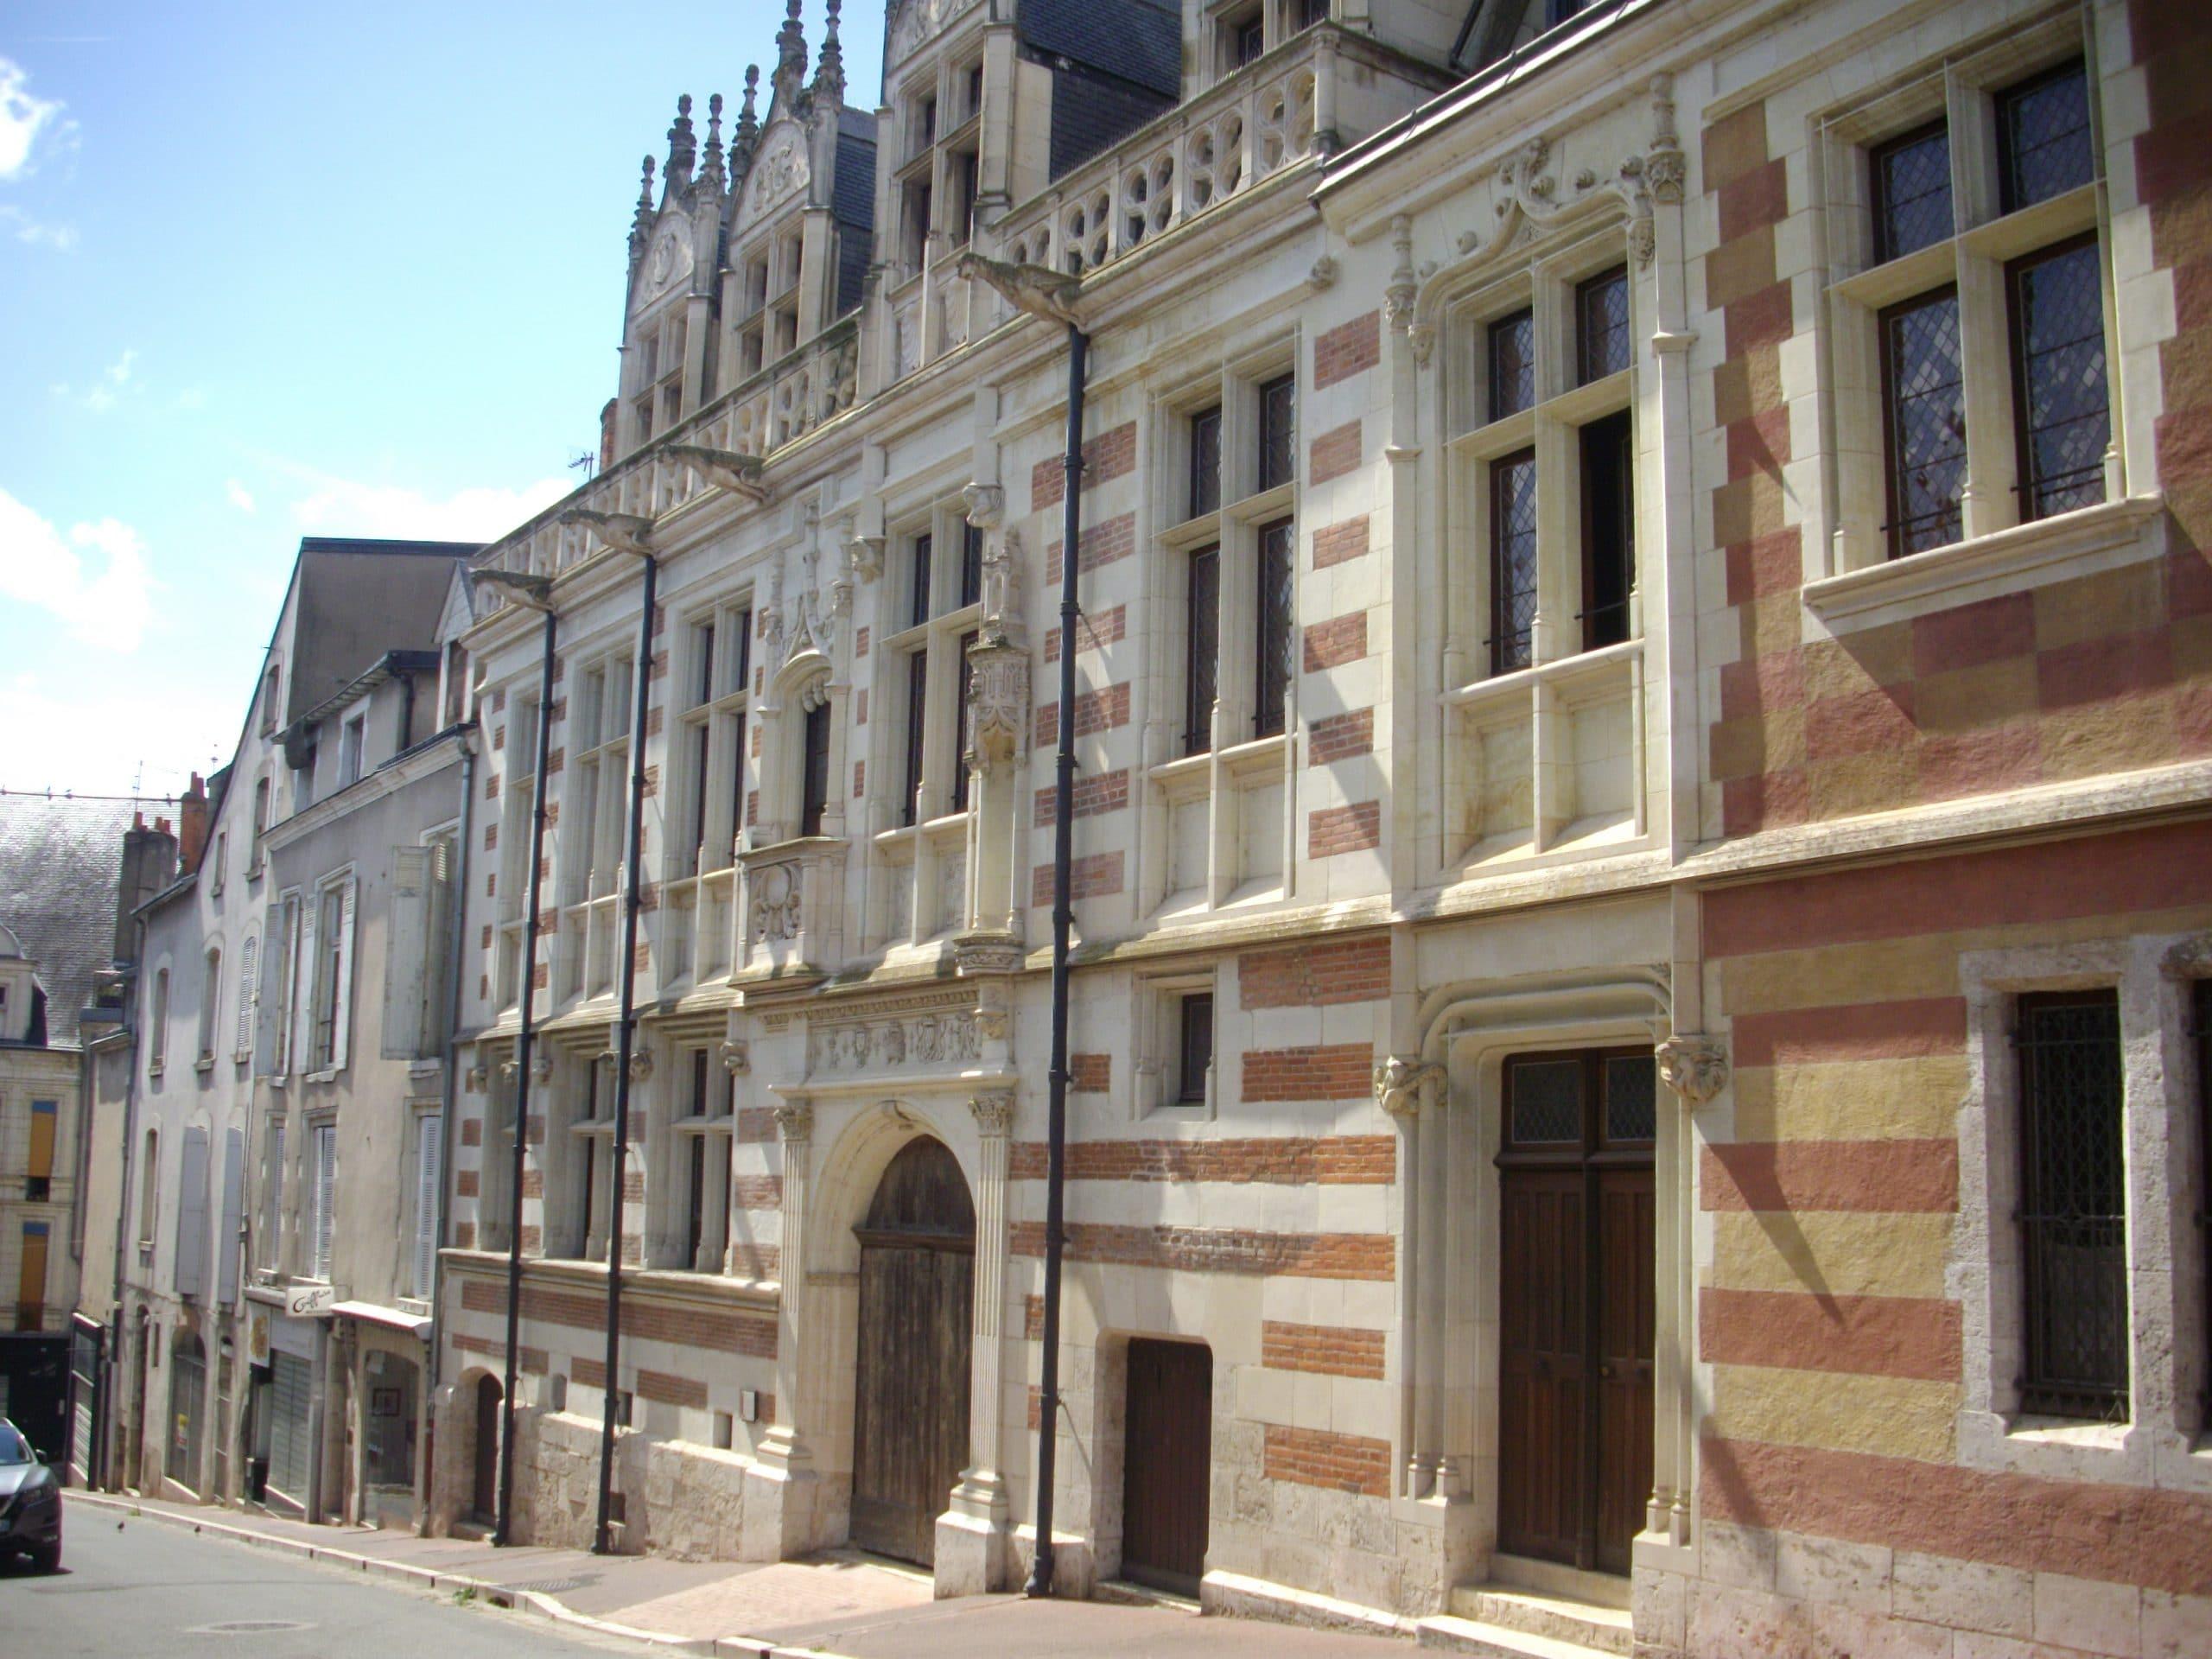 Hôtel particulier d'Alluye